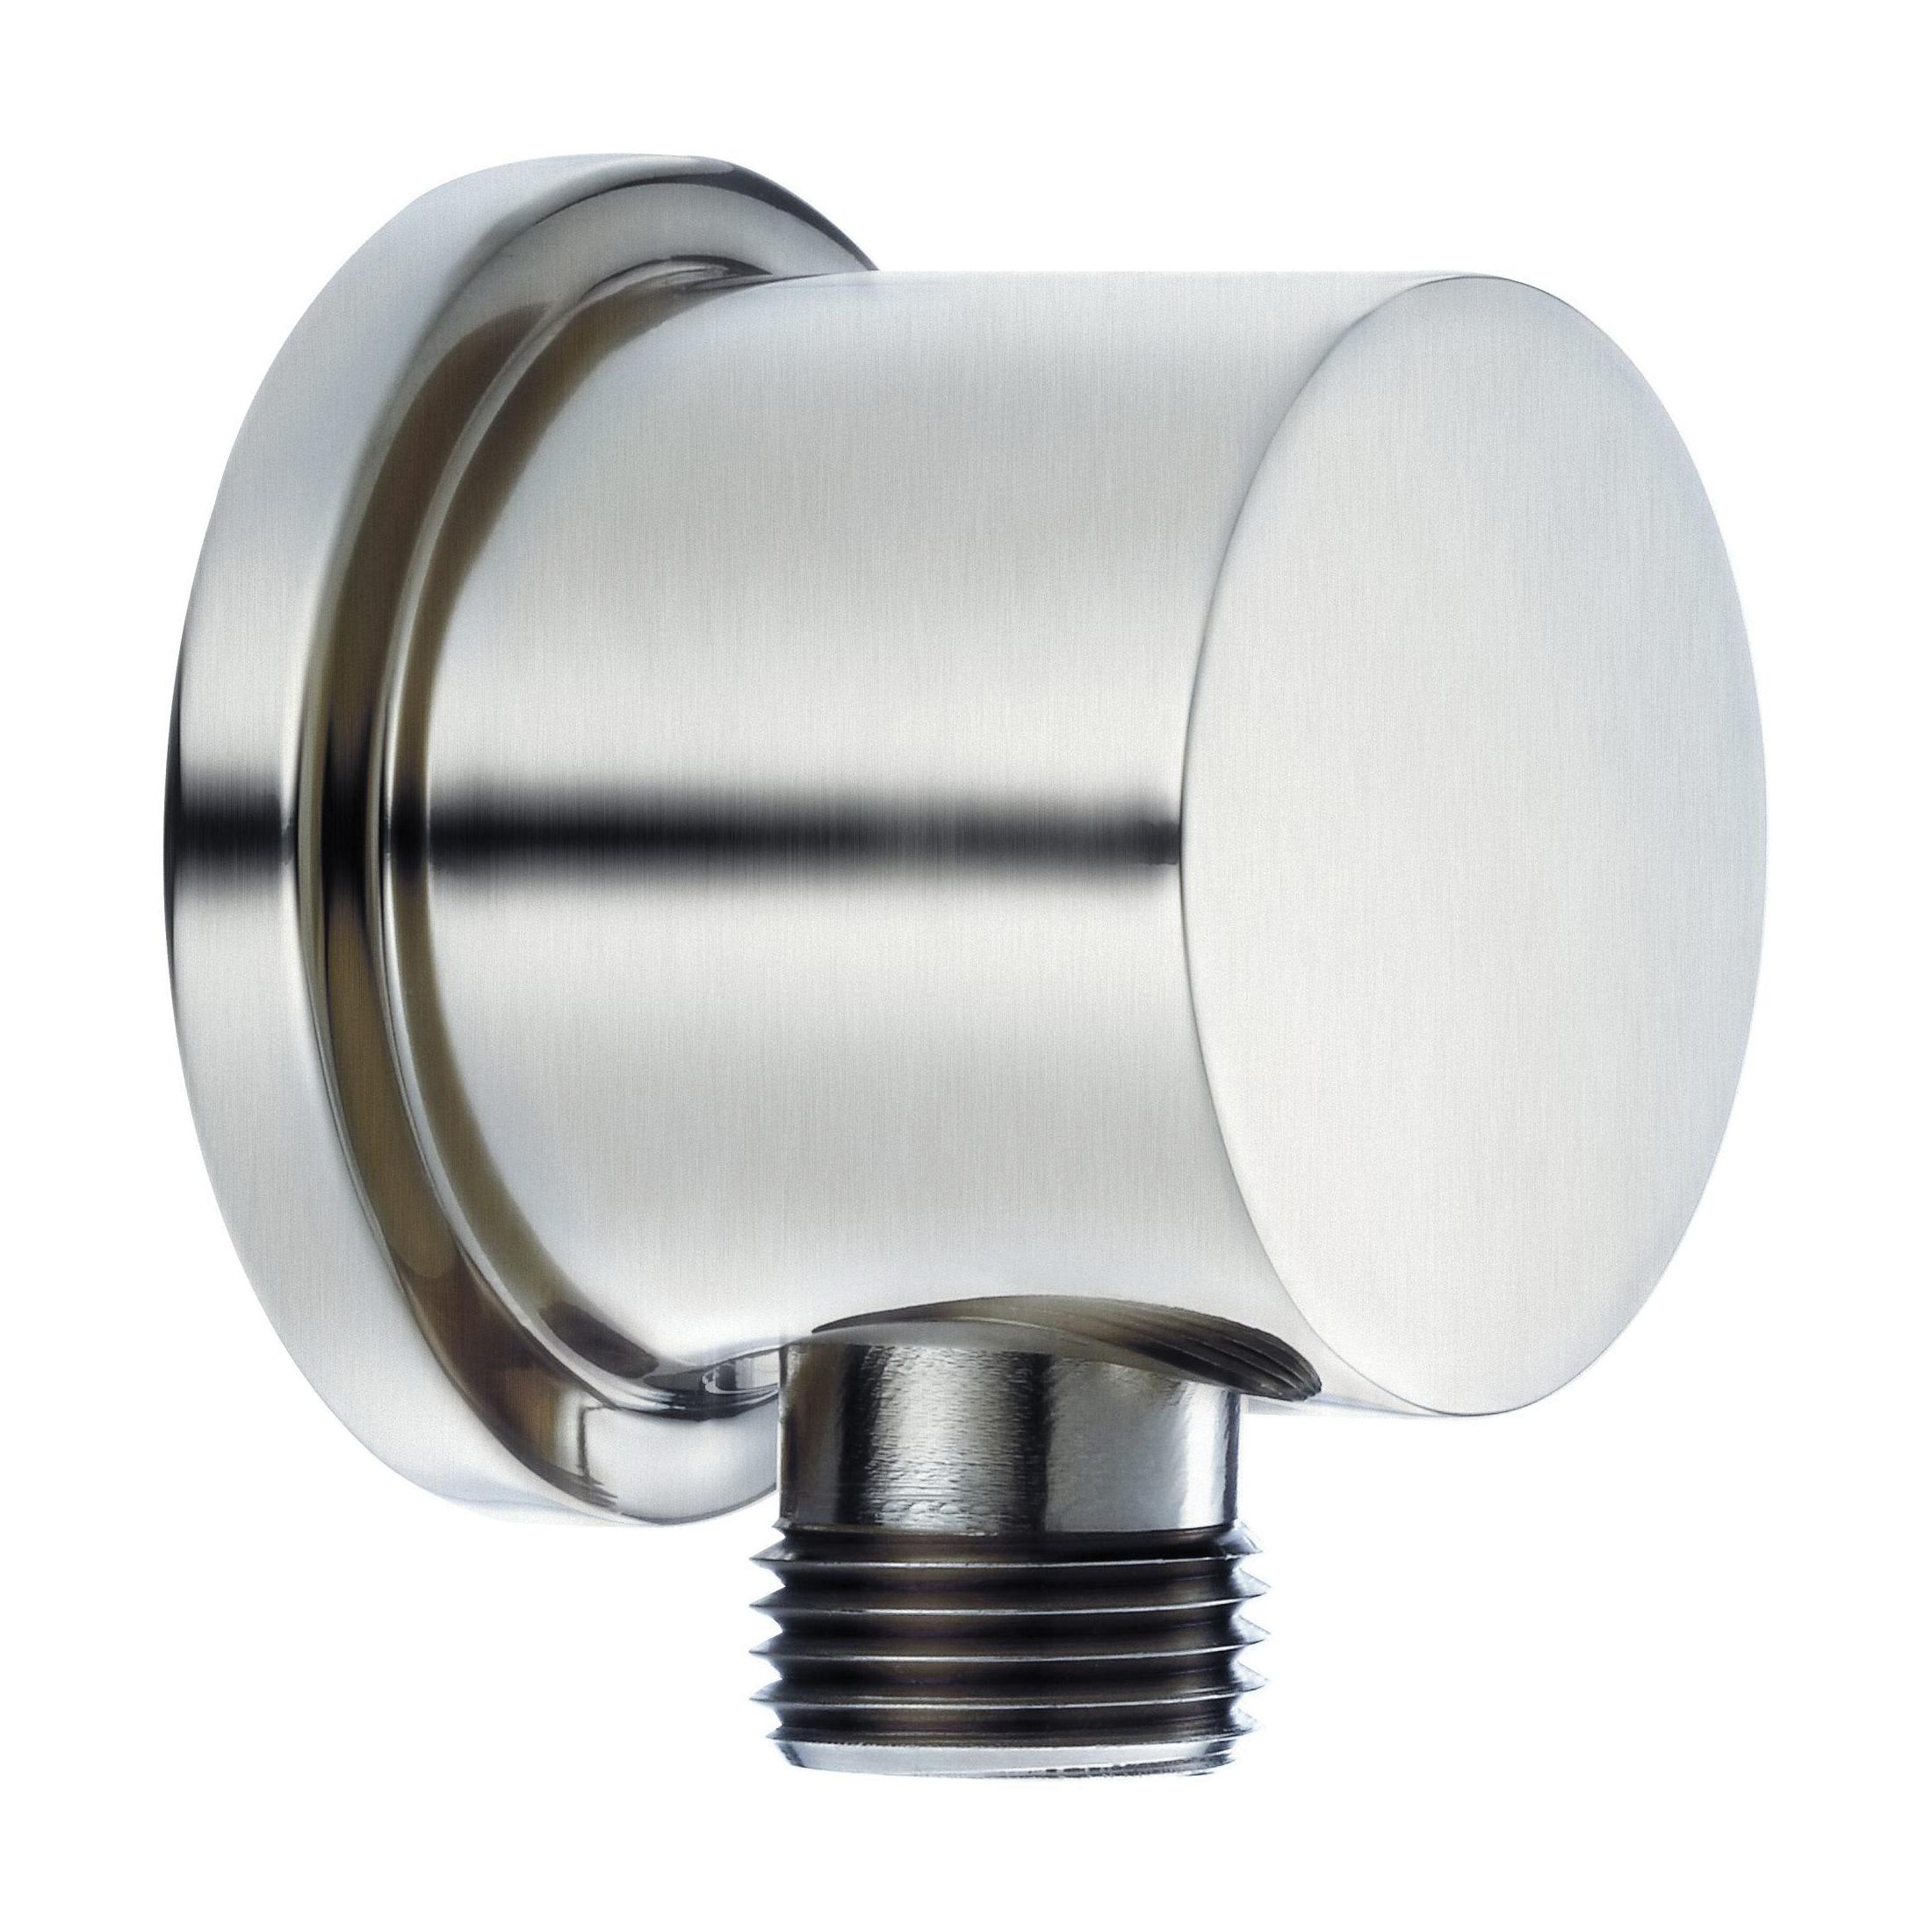 Danze® D469058BN Round Wall Mount Supply Elbow, 1/2-14, NPSM, Brass